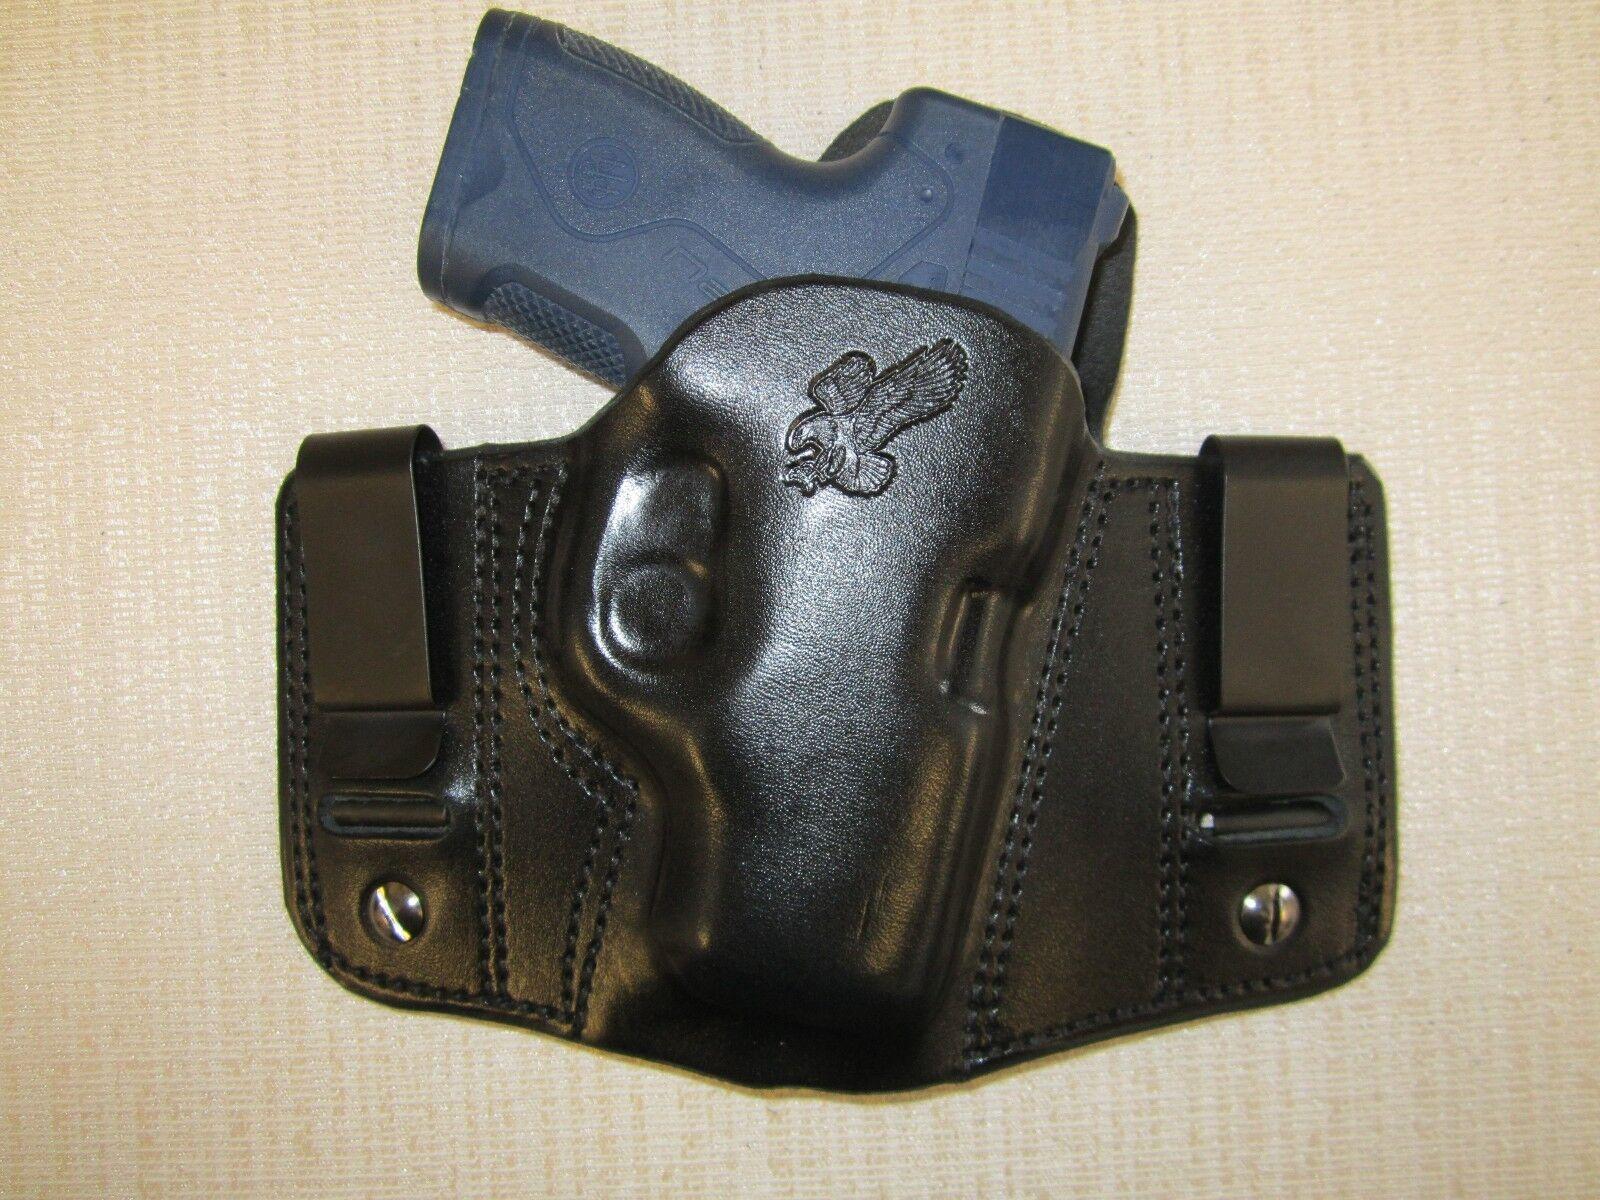 BERETTA NANO,  REVERSIBLE, IWB OR OWB, R H, formed pancake belt holster